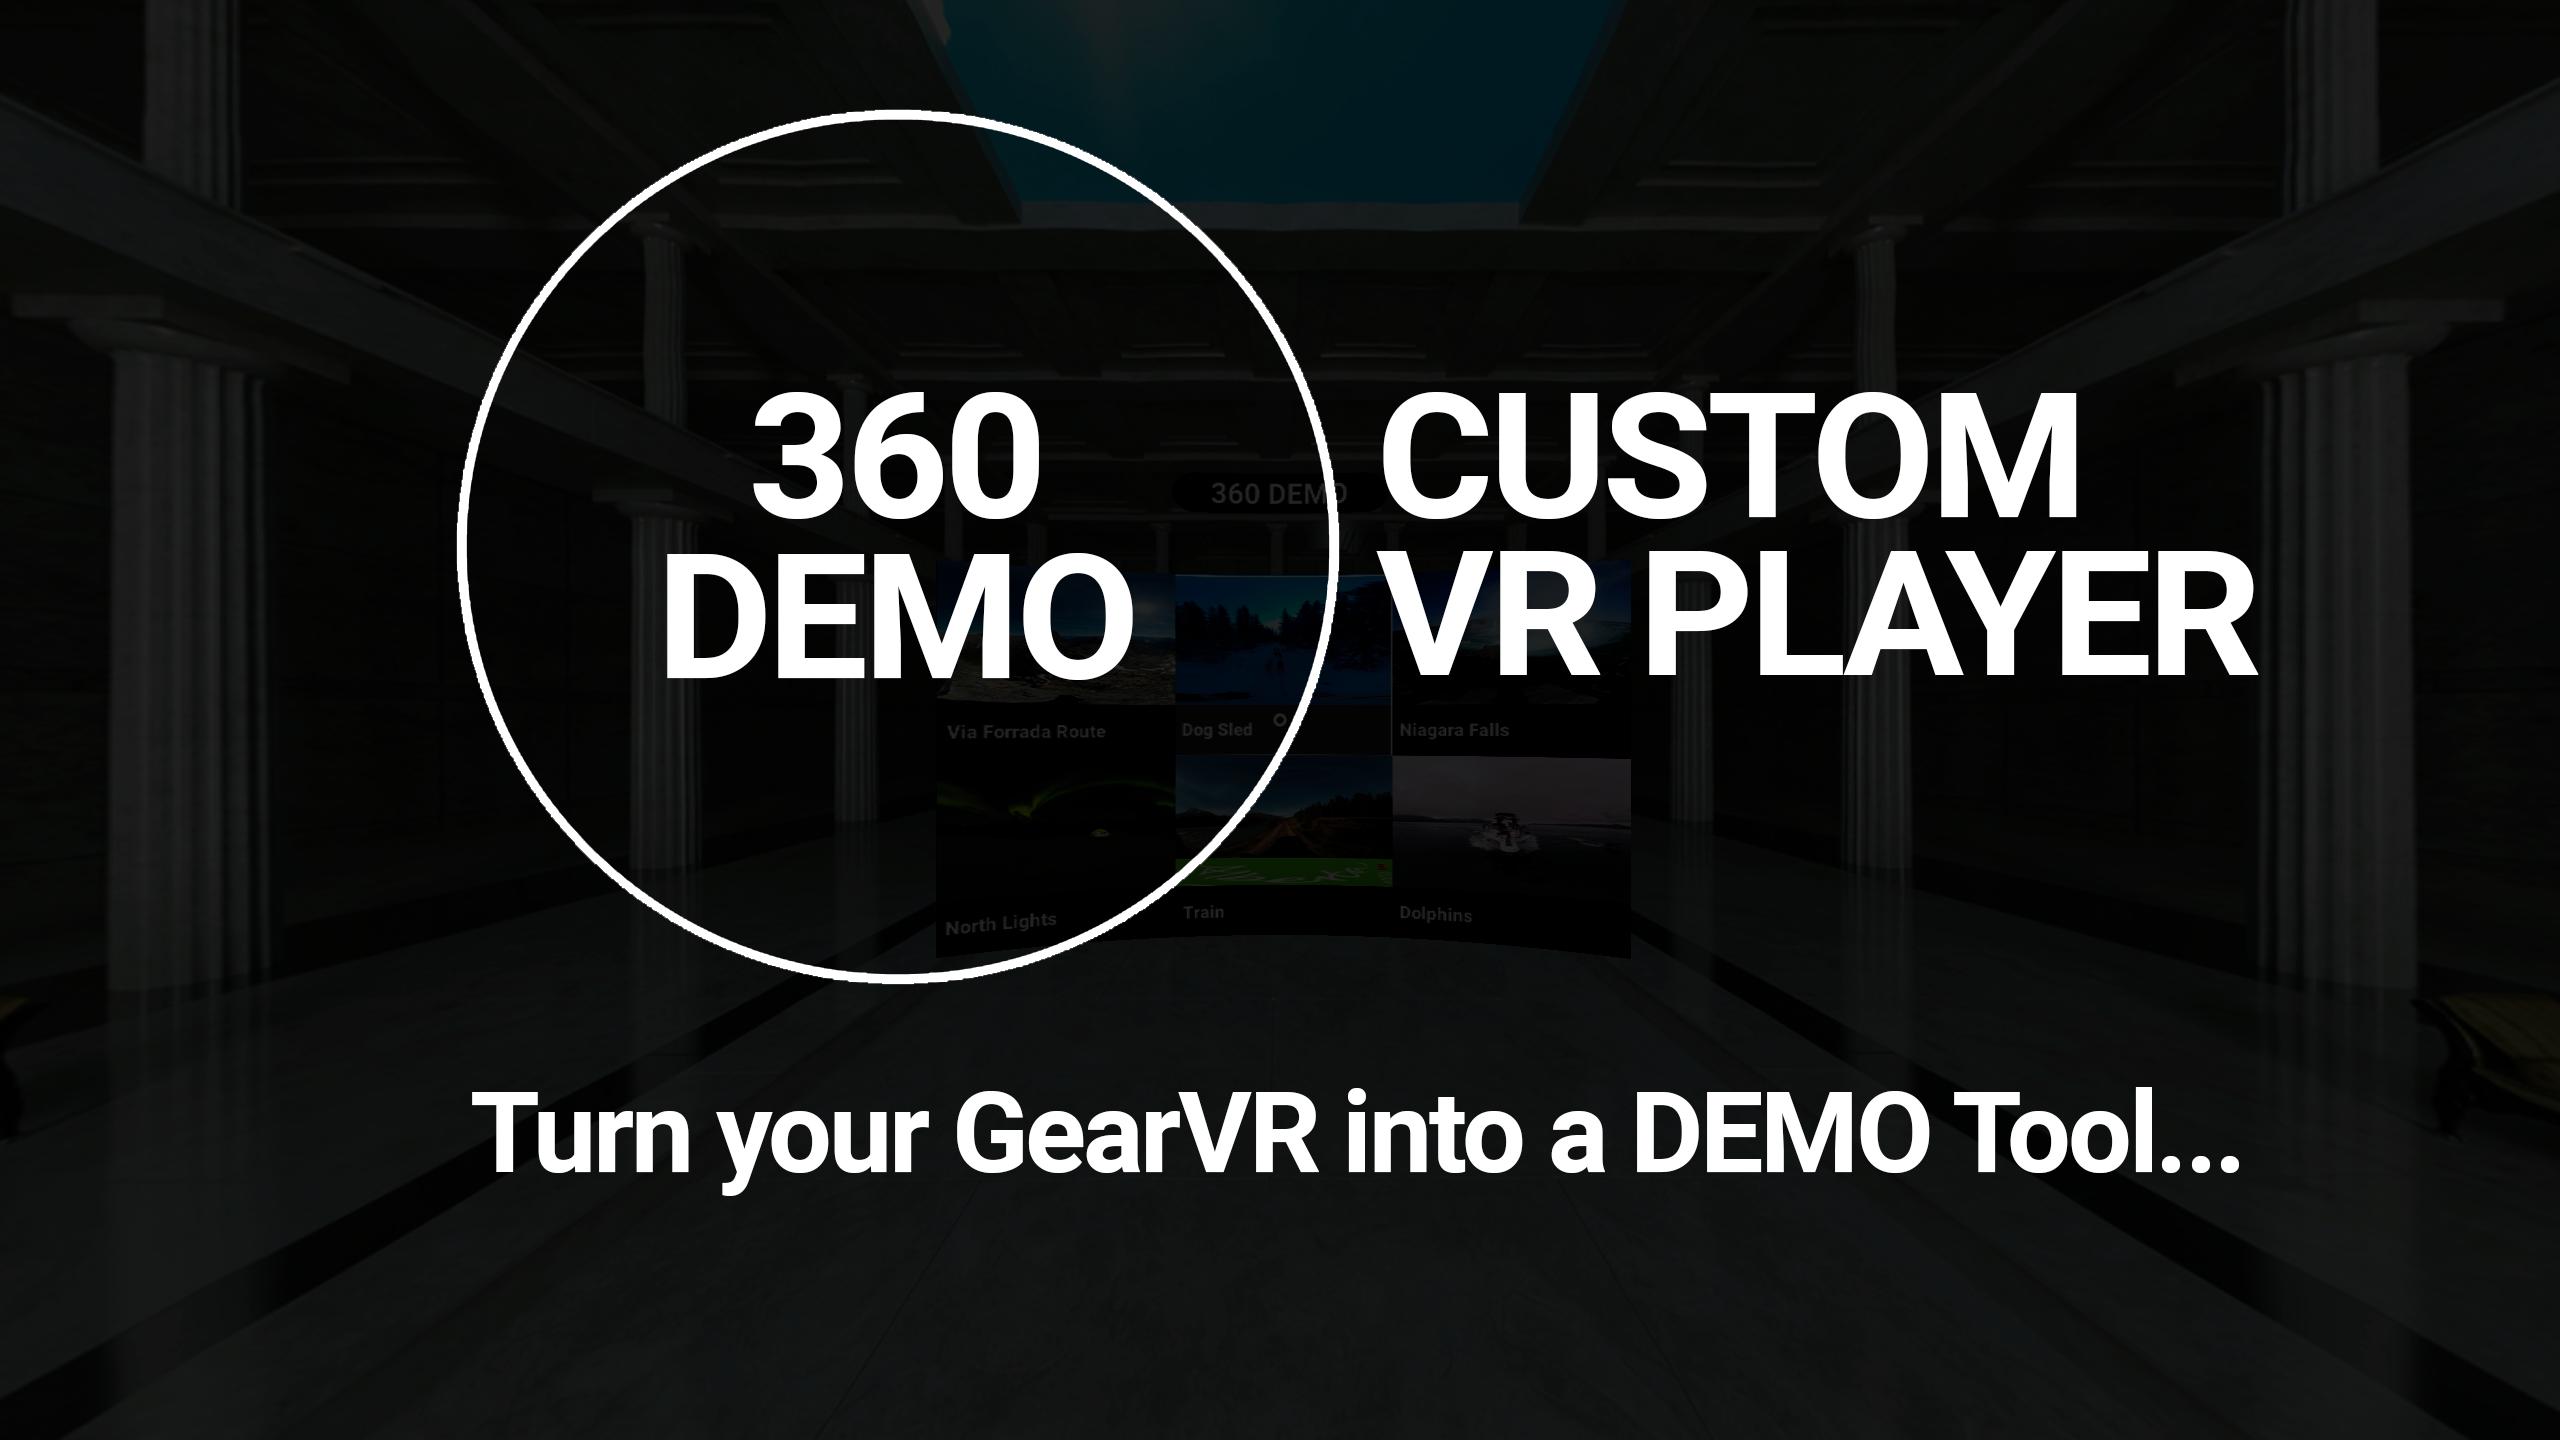 360 Demo